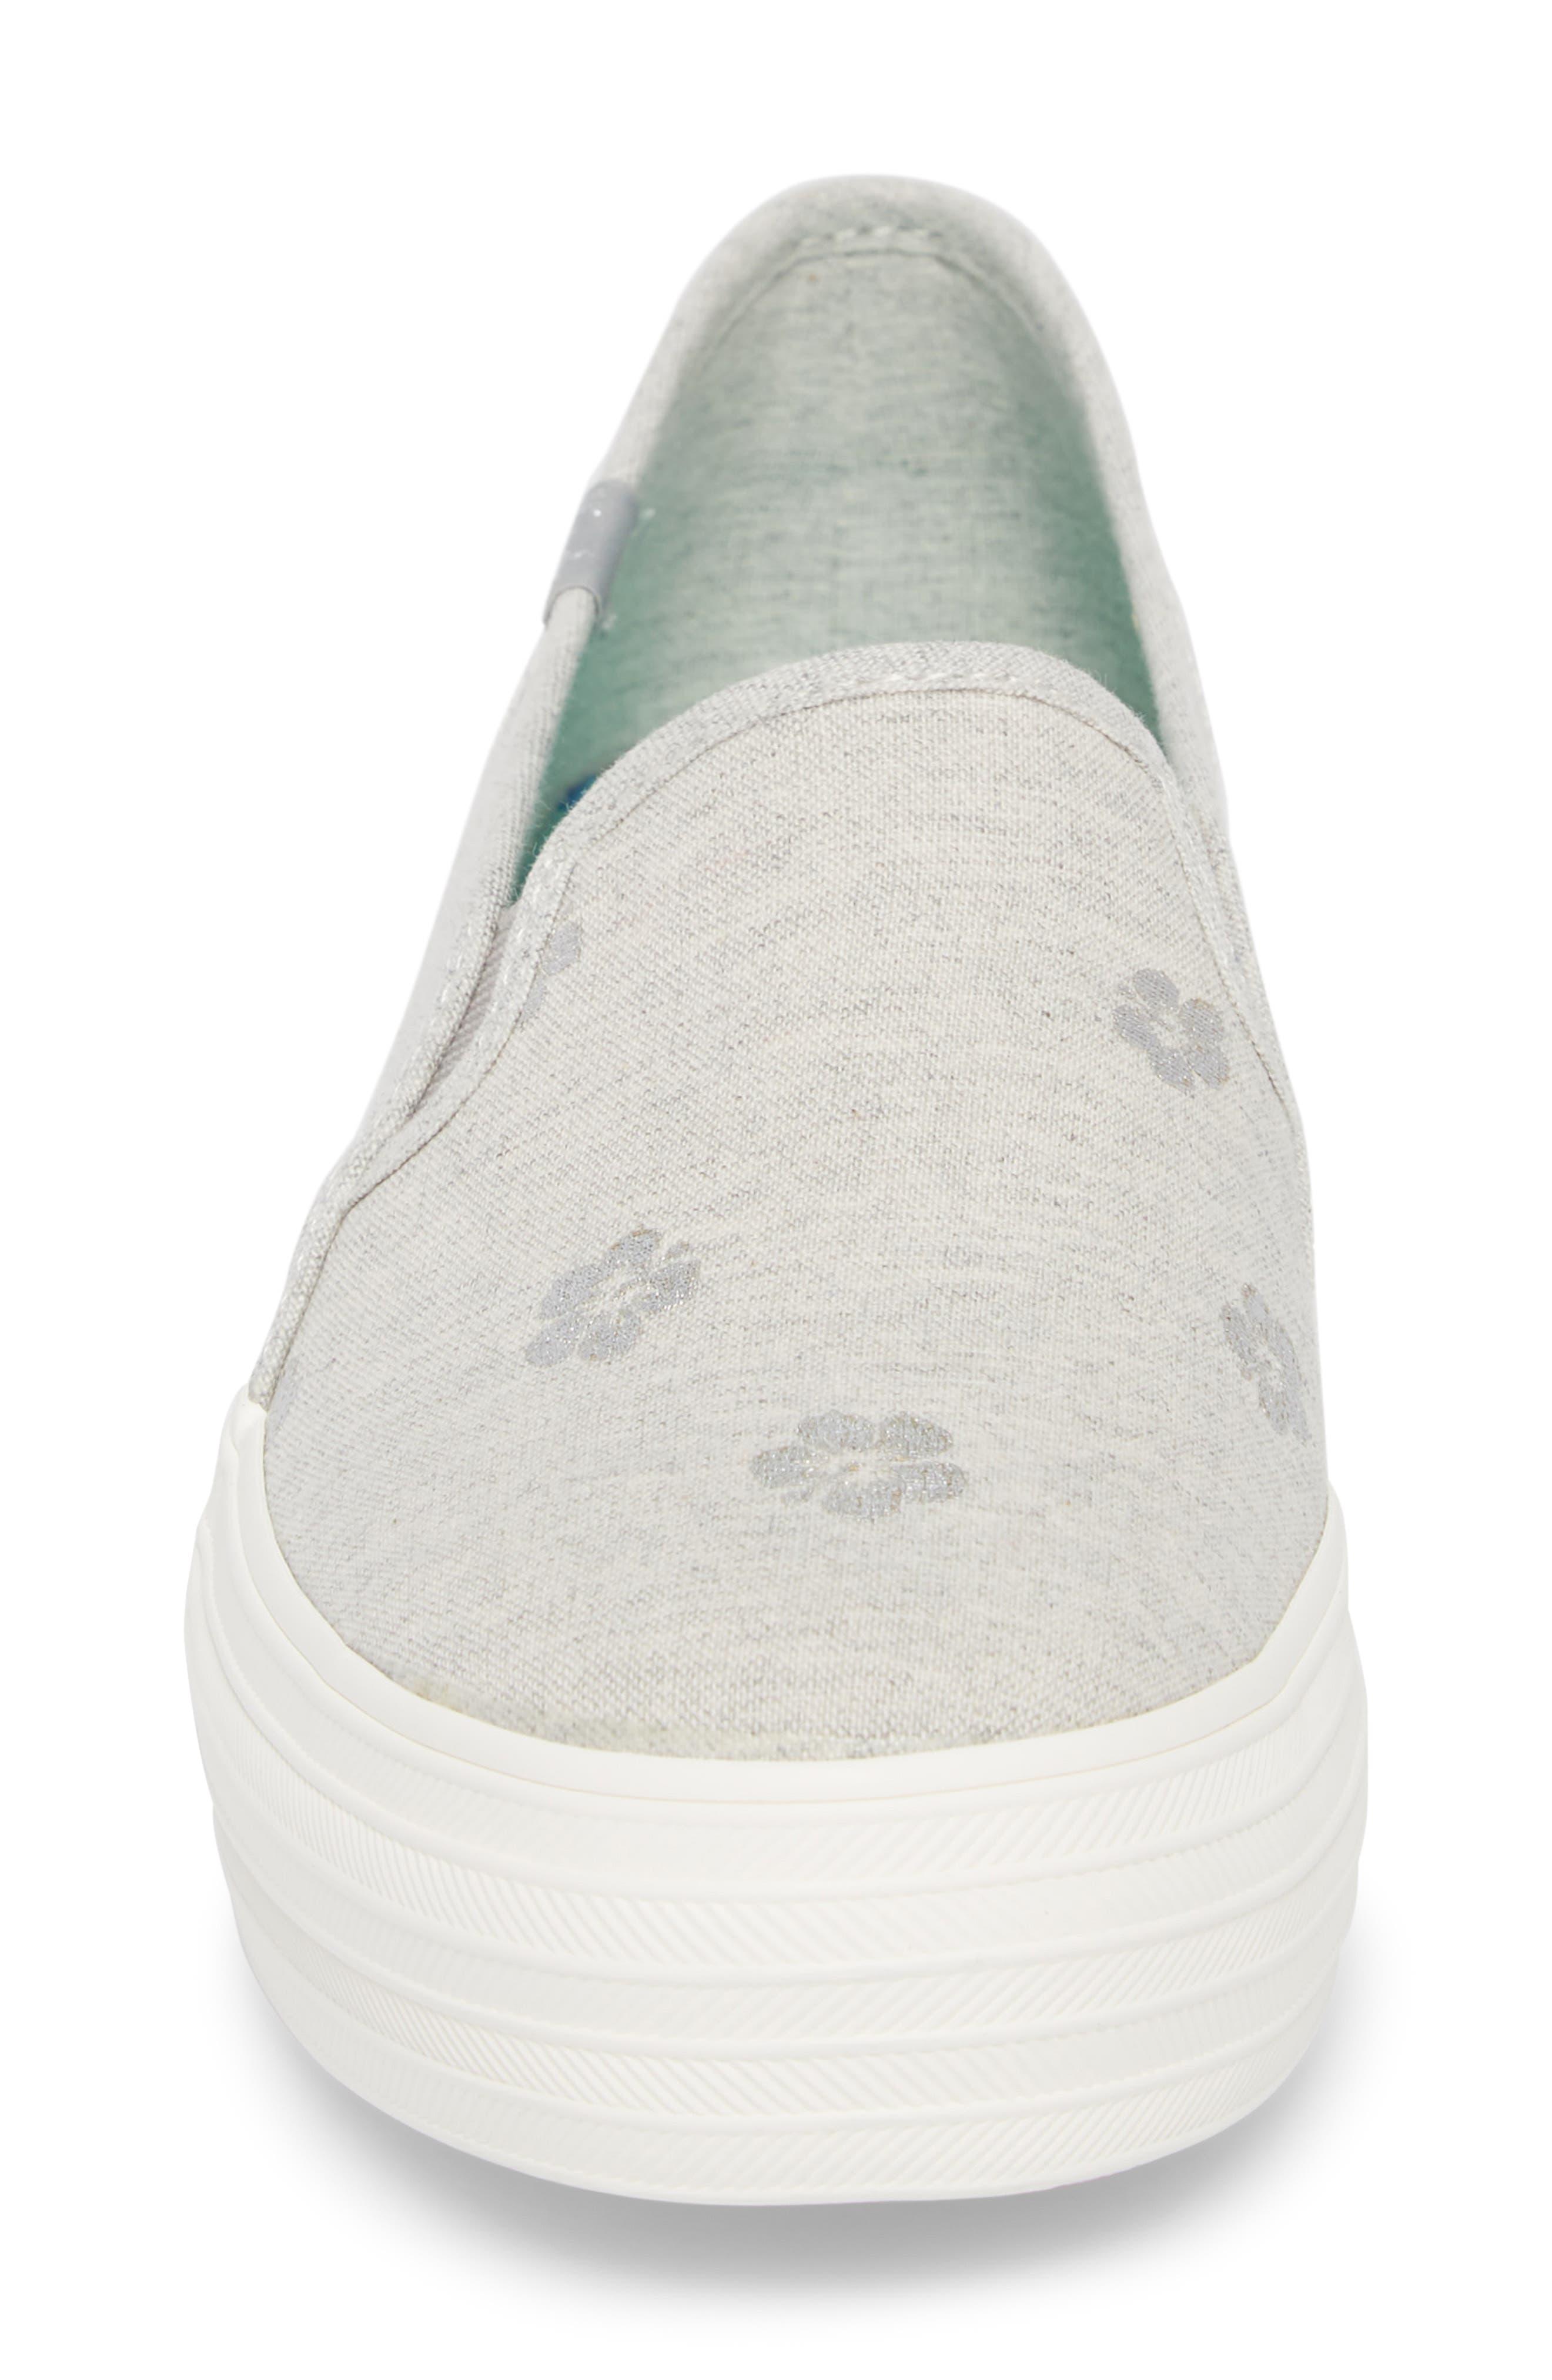 Triple Decker Hibiscus Slip-On Platform Sneaker,                             Alternate thumbnail 4, color,                             050